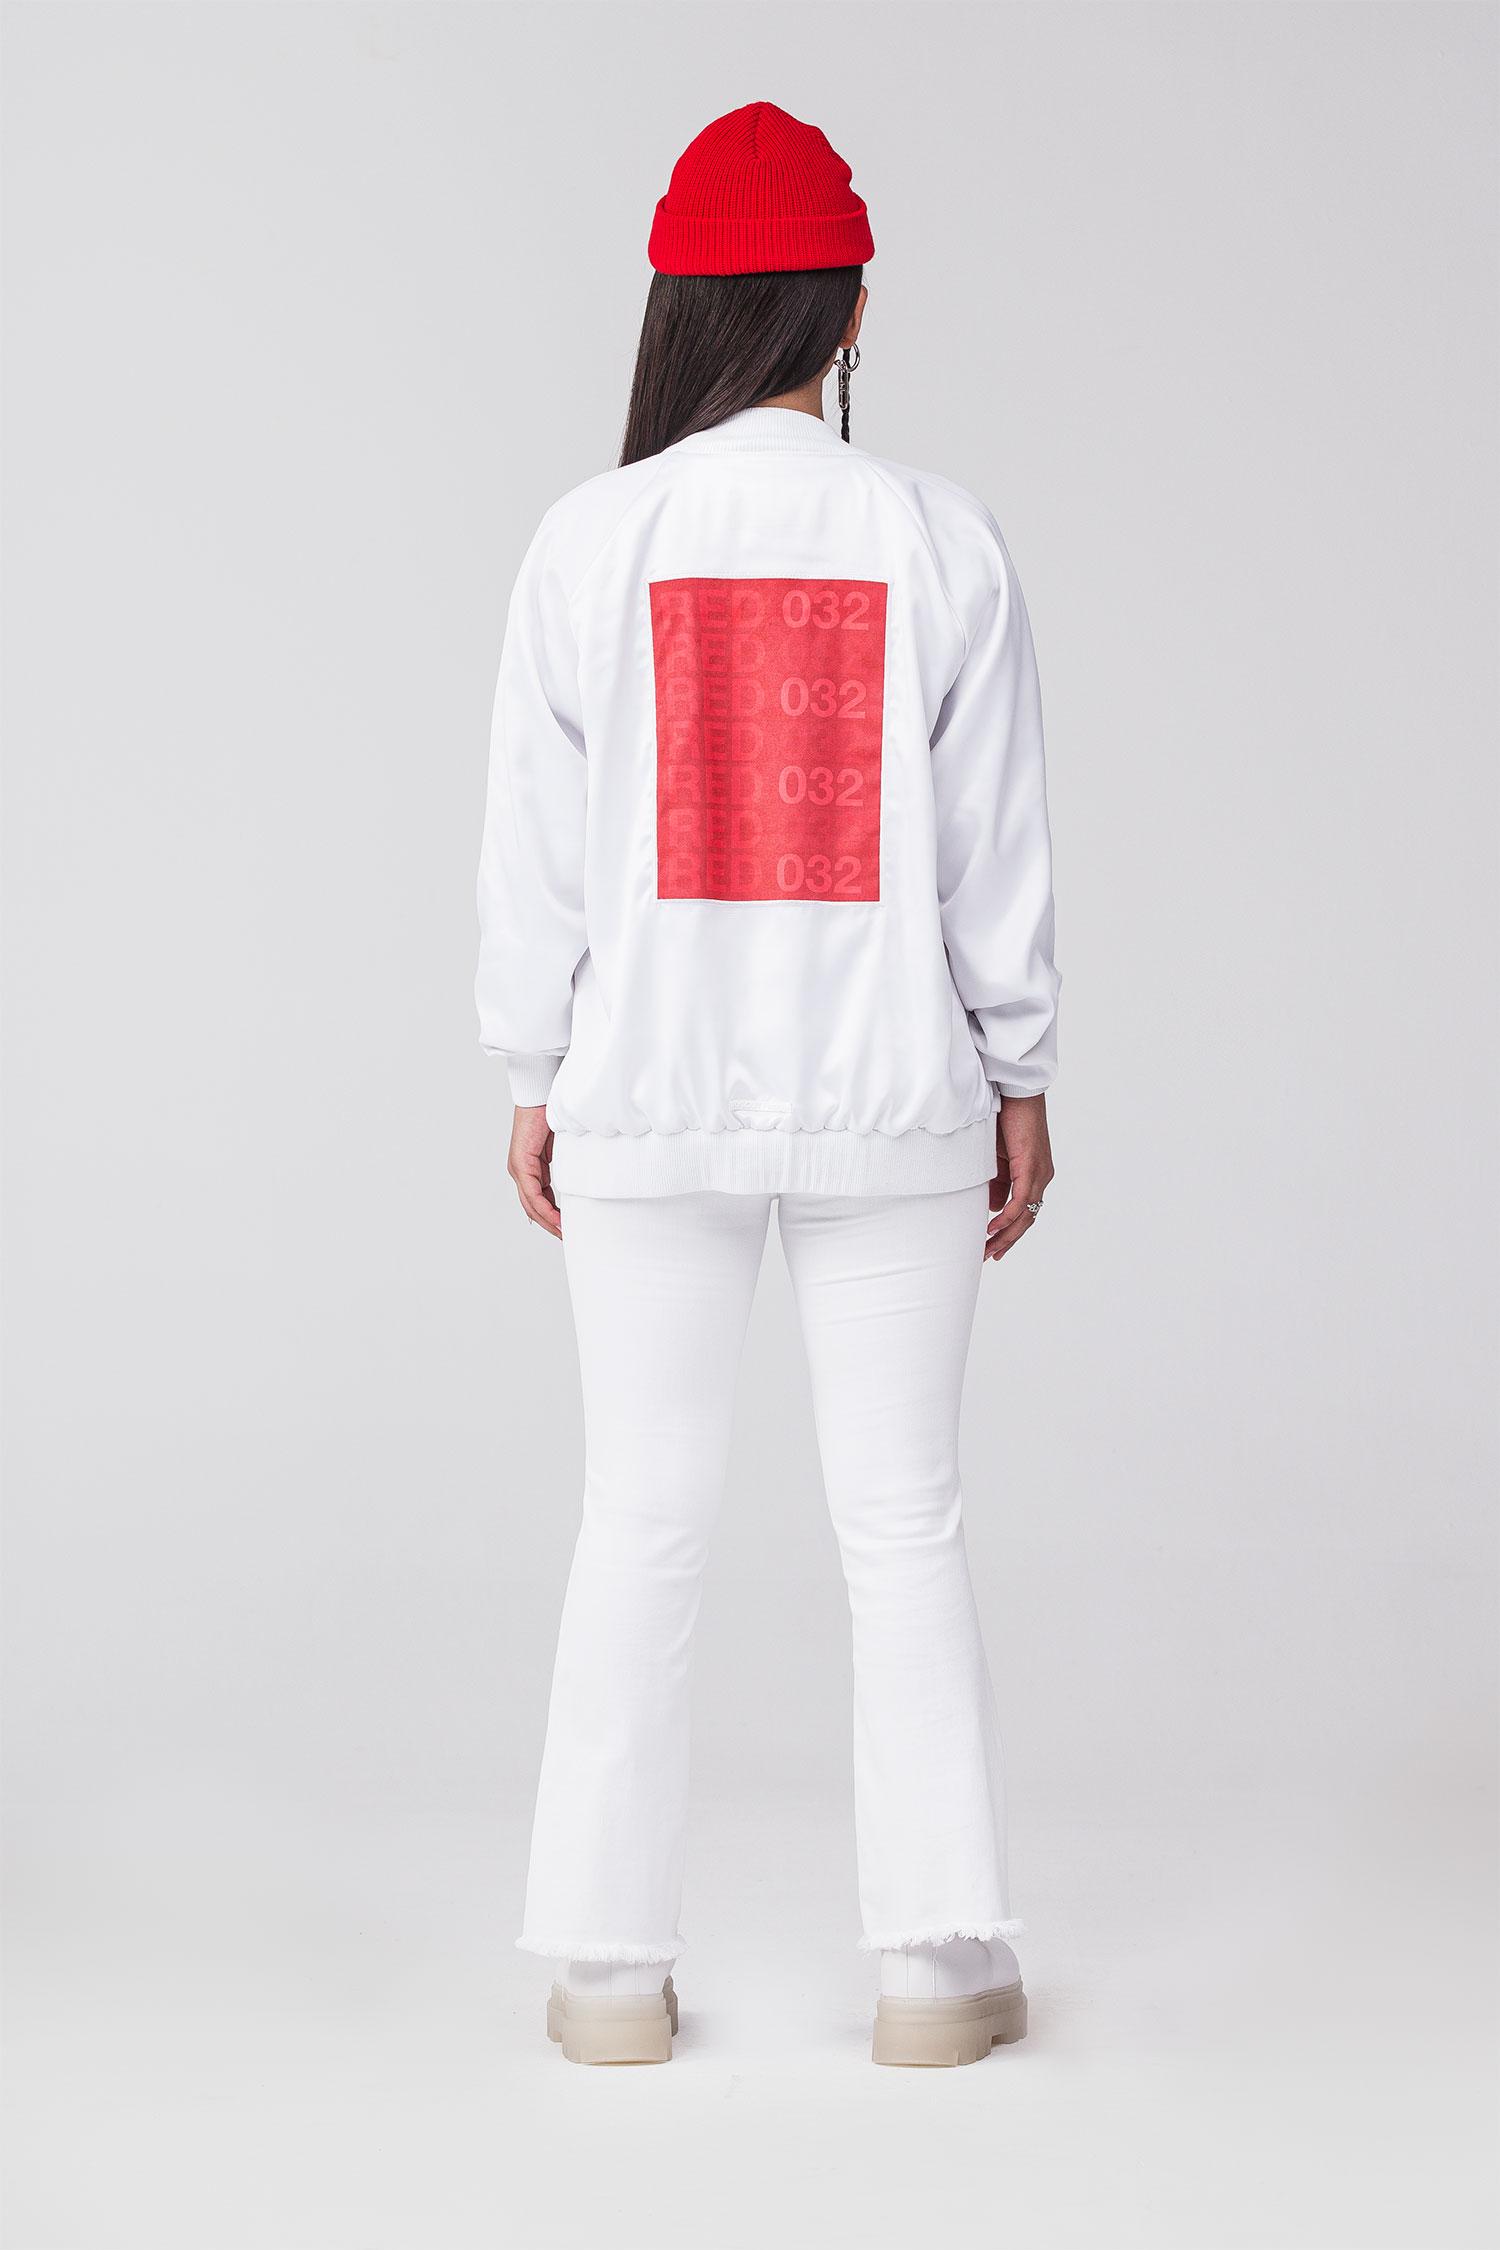 REND_Red-032-white-trasero